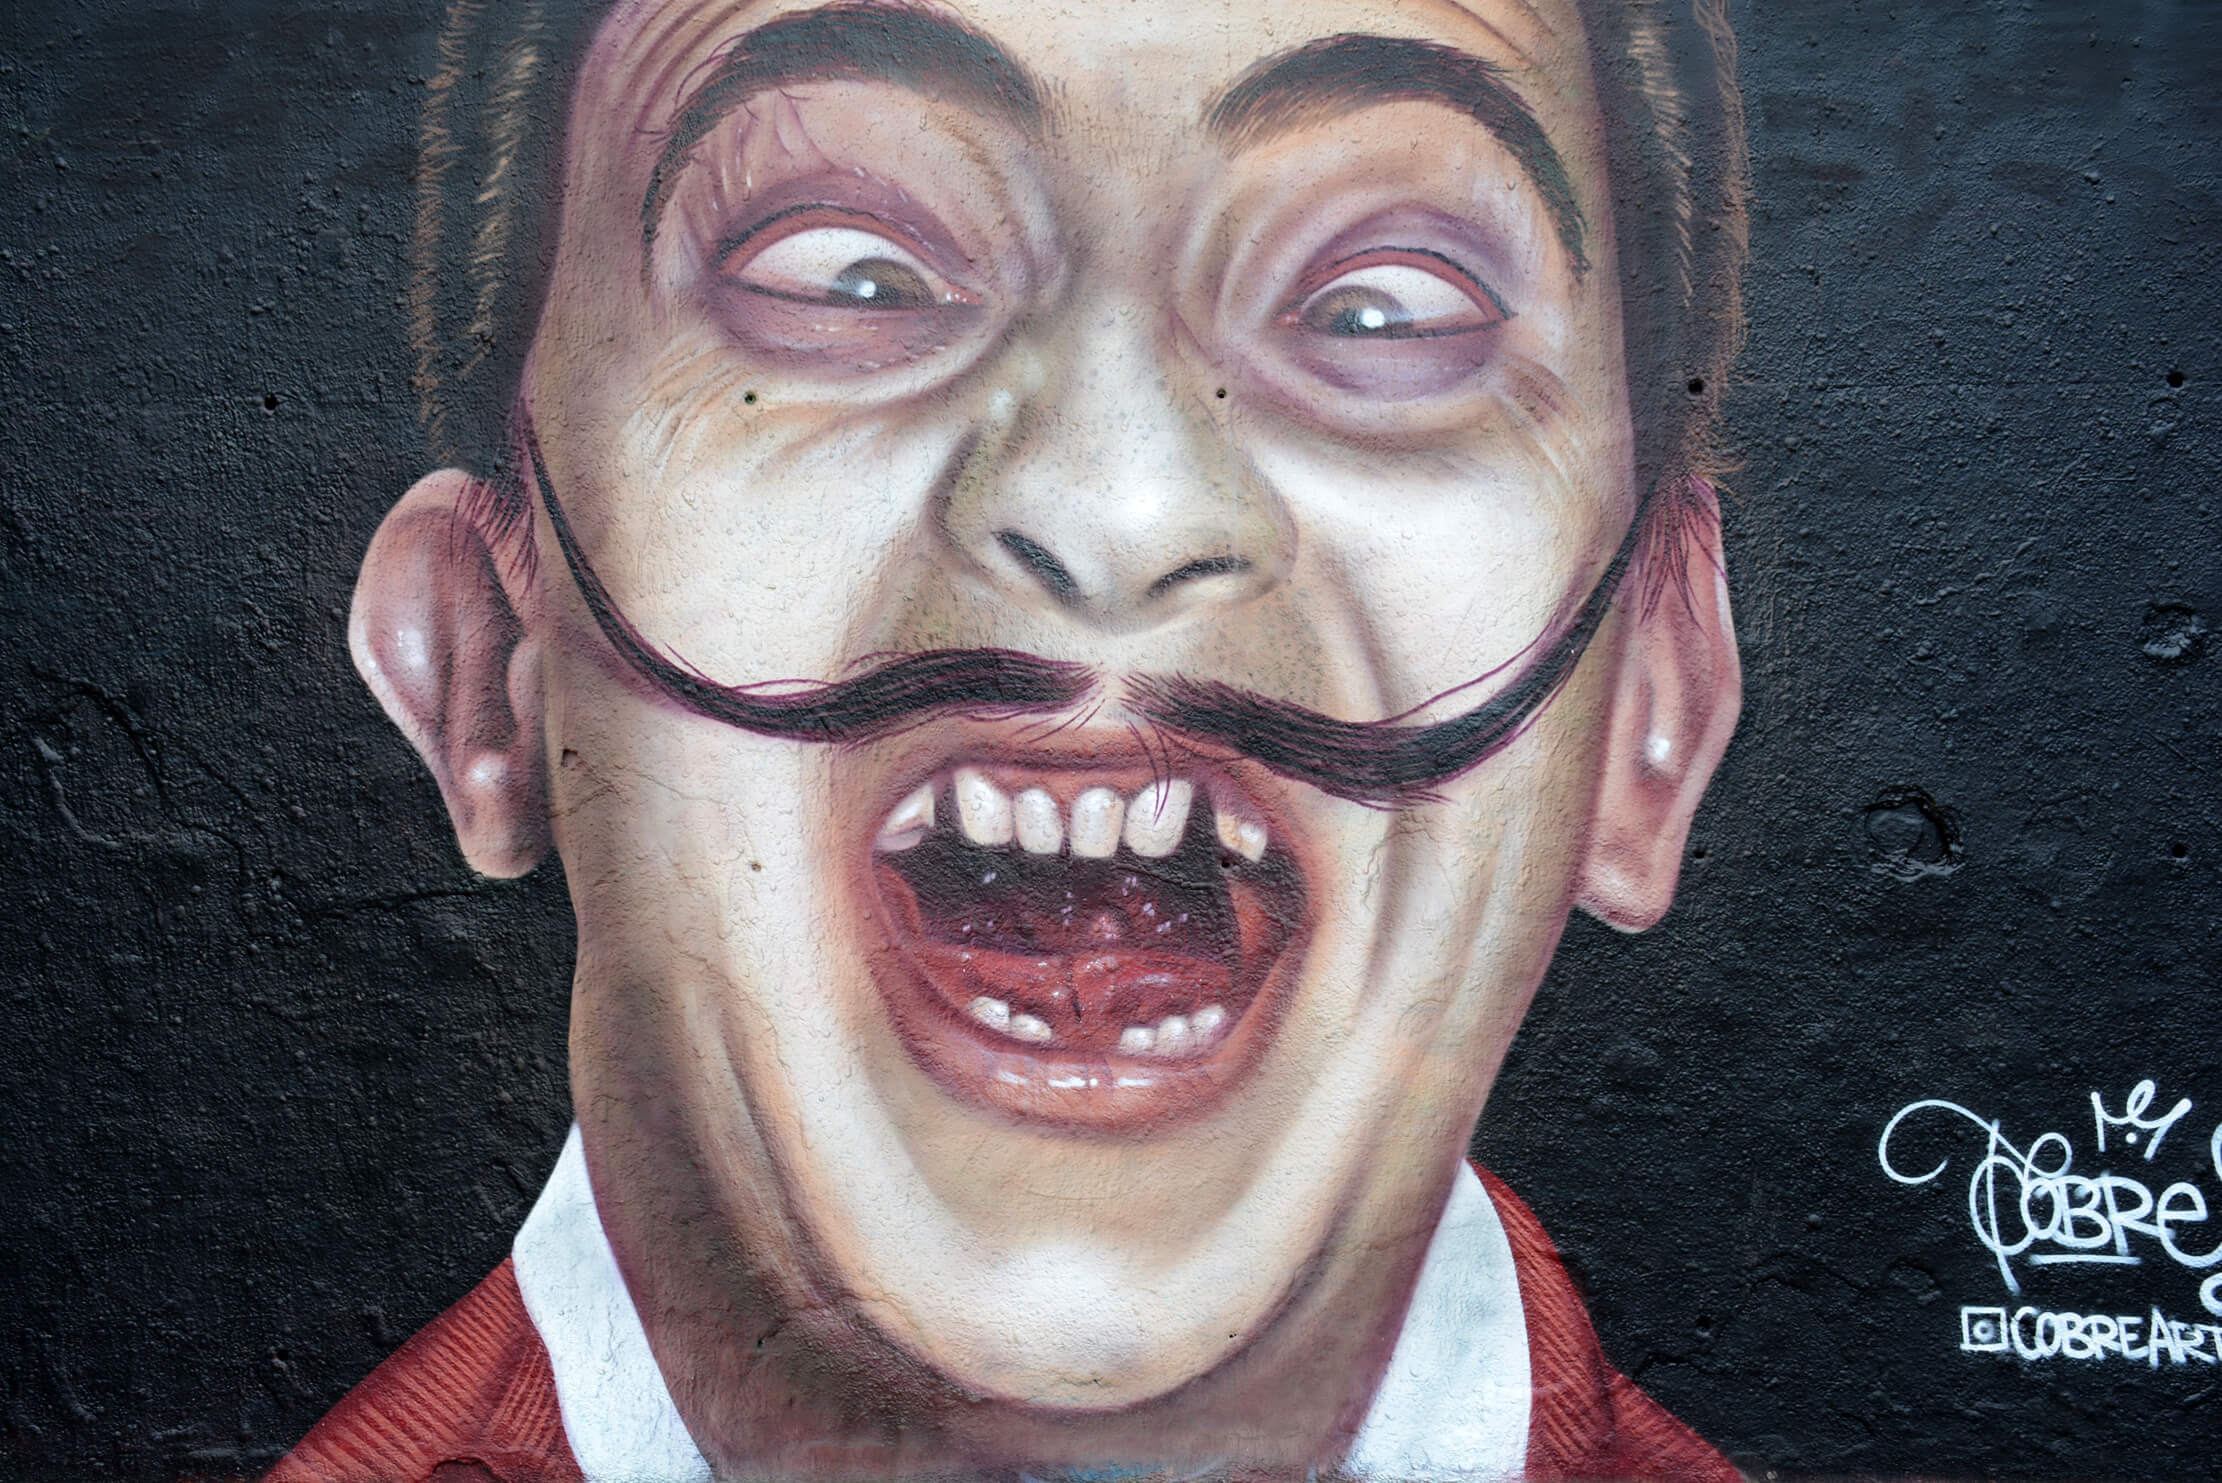 mural de salvador Dalí por cobre